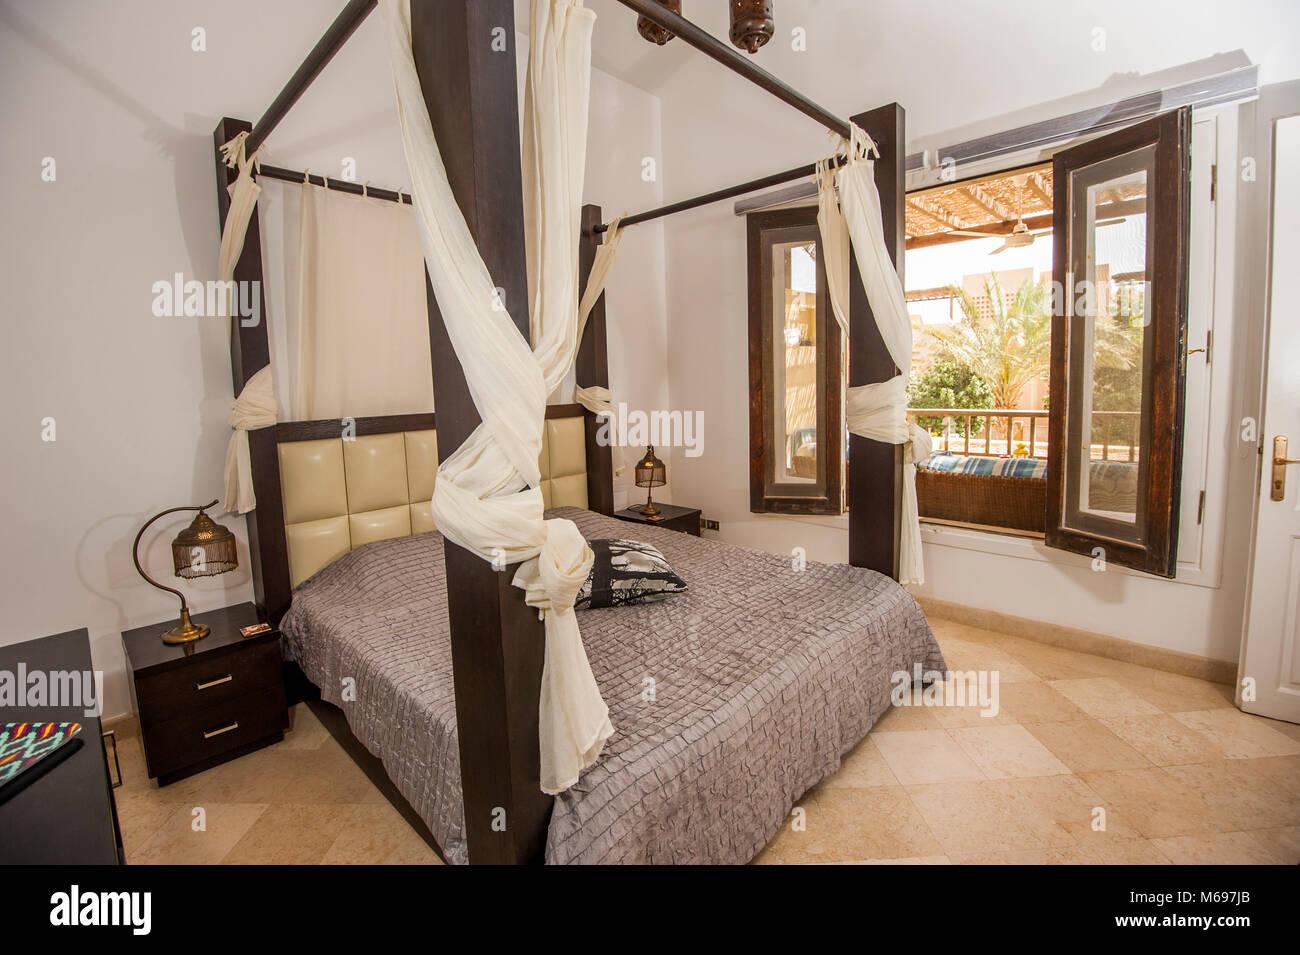 Interior design decor furnishing of luxury show home tropical villa ...